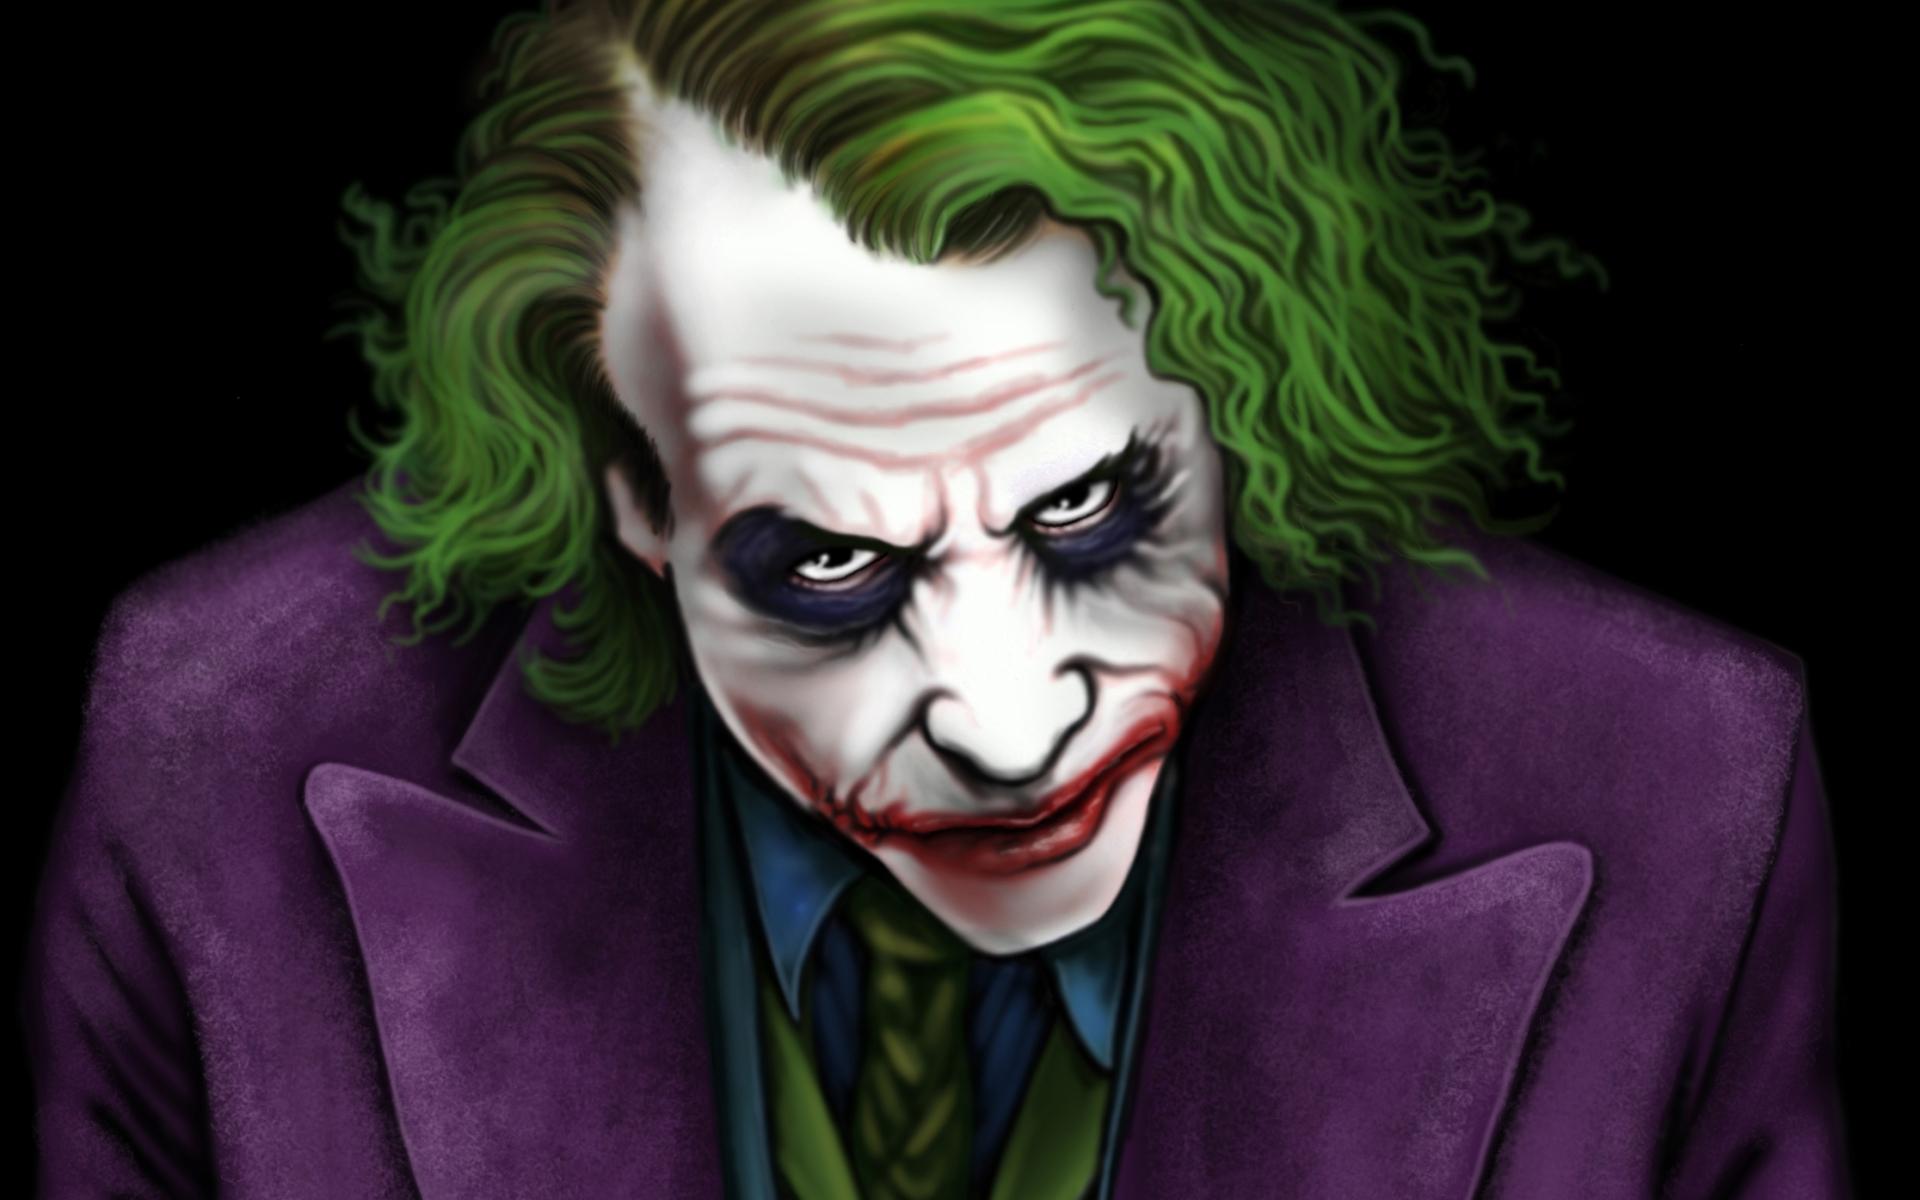 Wallpaper Of Heath Ledger Joker Painting Art The Heath